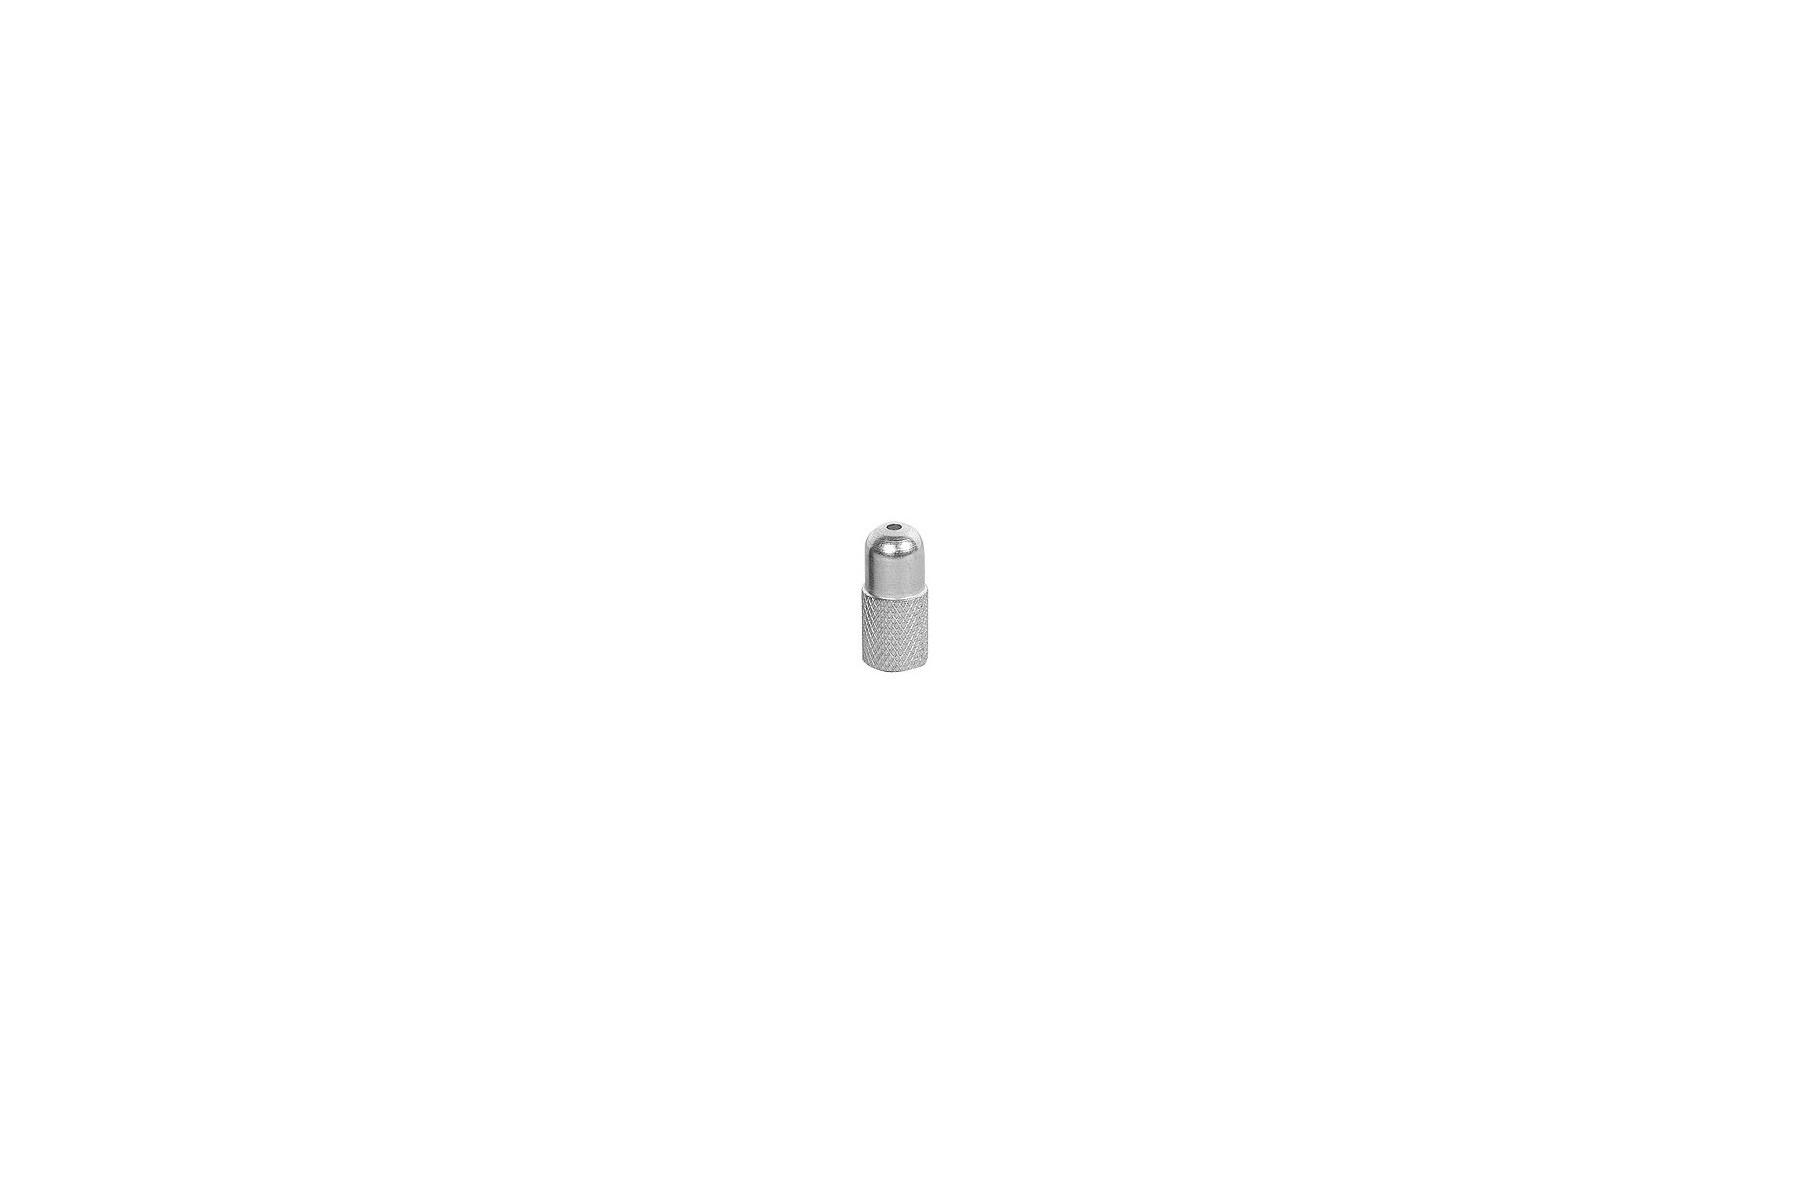 Rema Tip Top Ventilkappe Stahl für Sclaverandventil